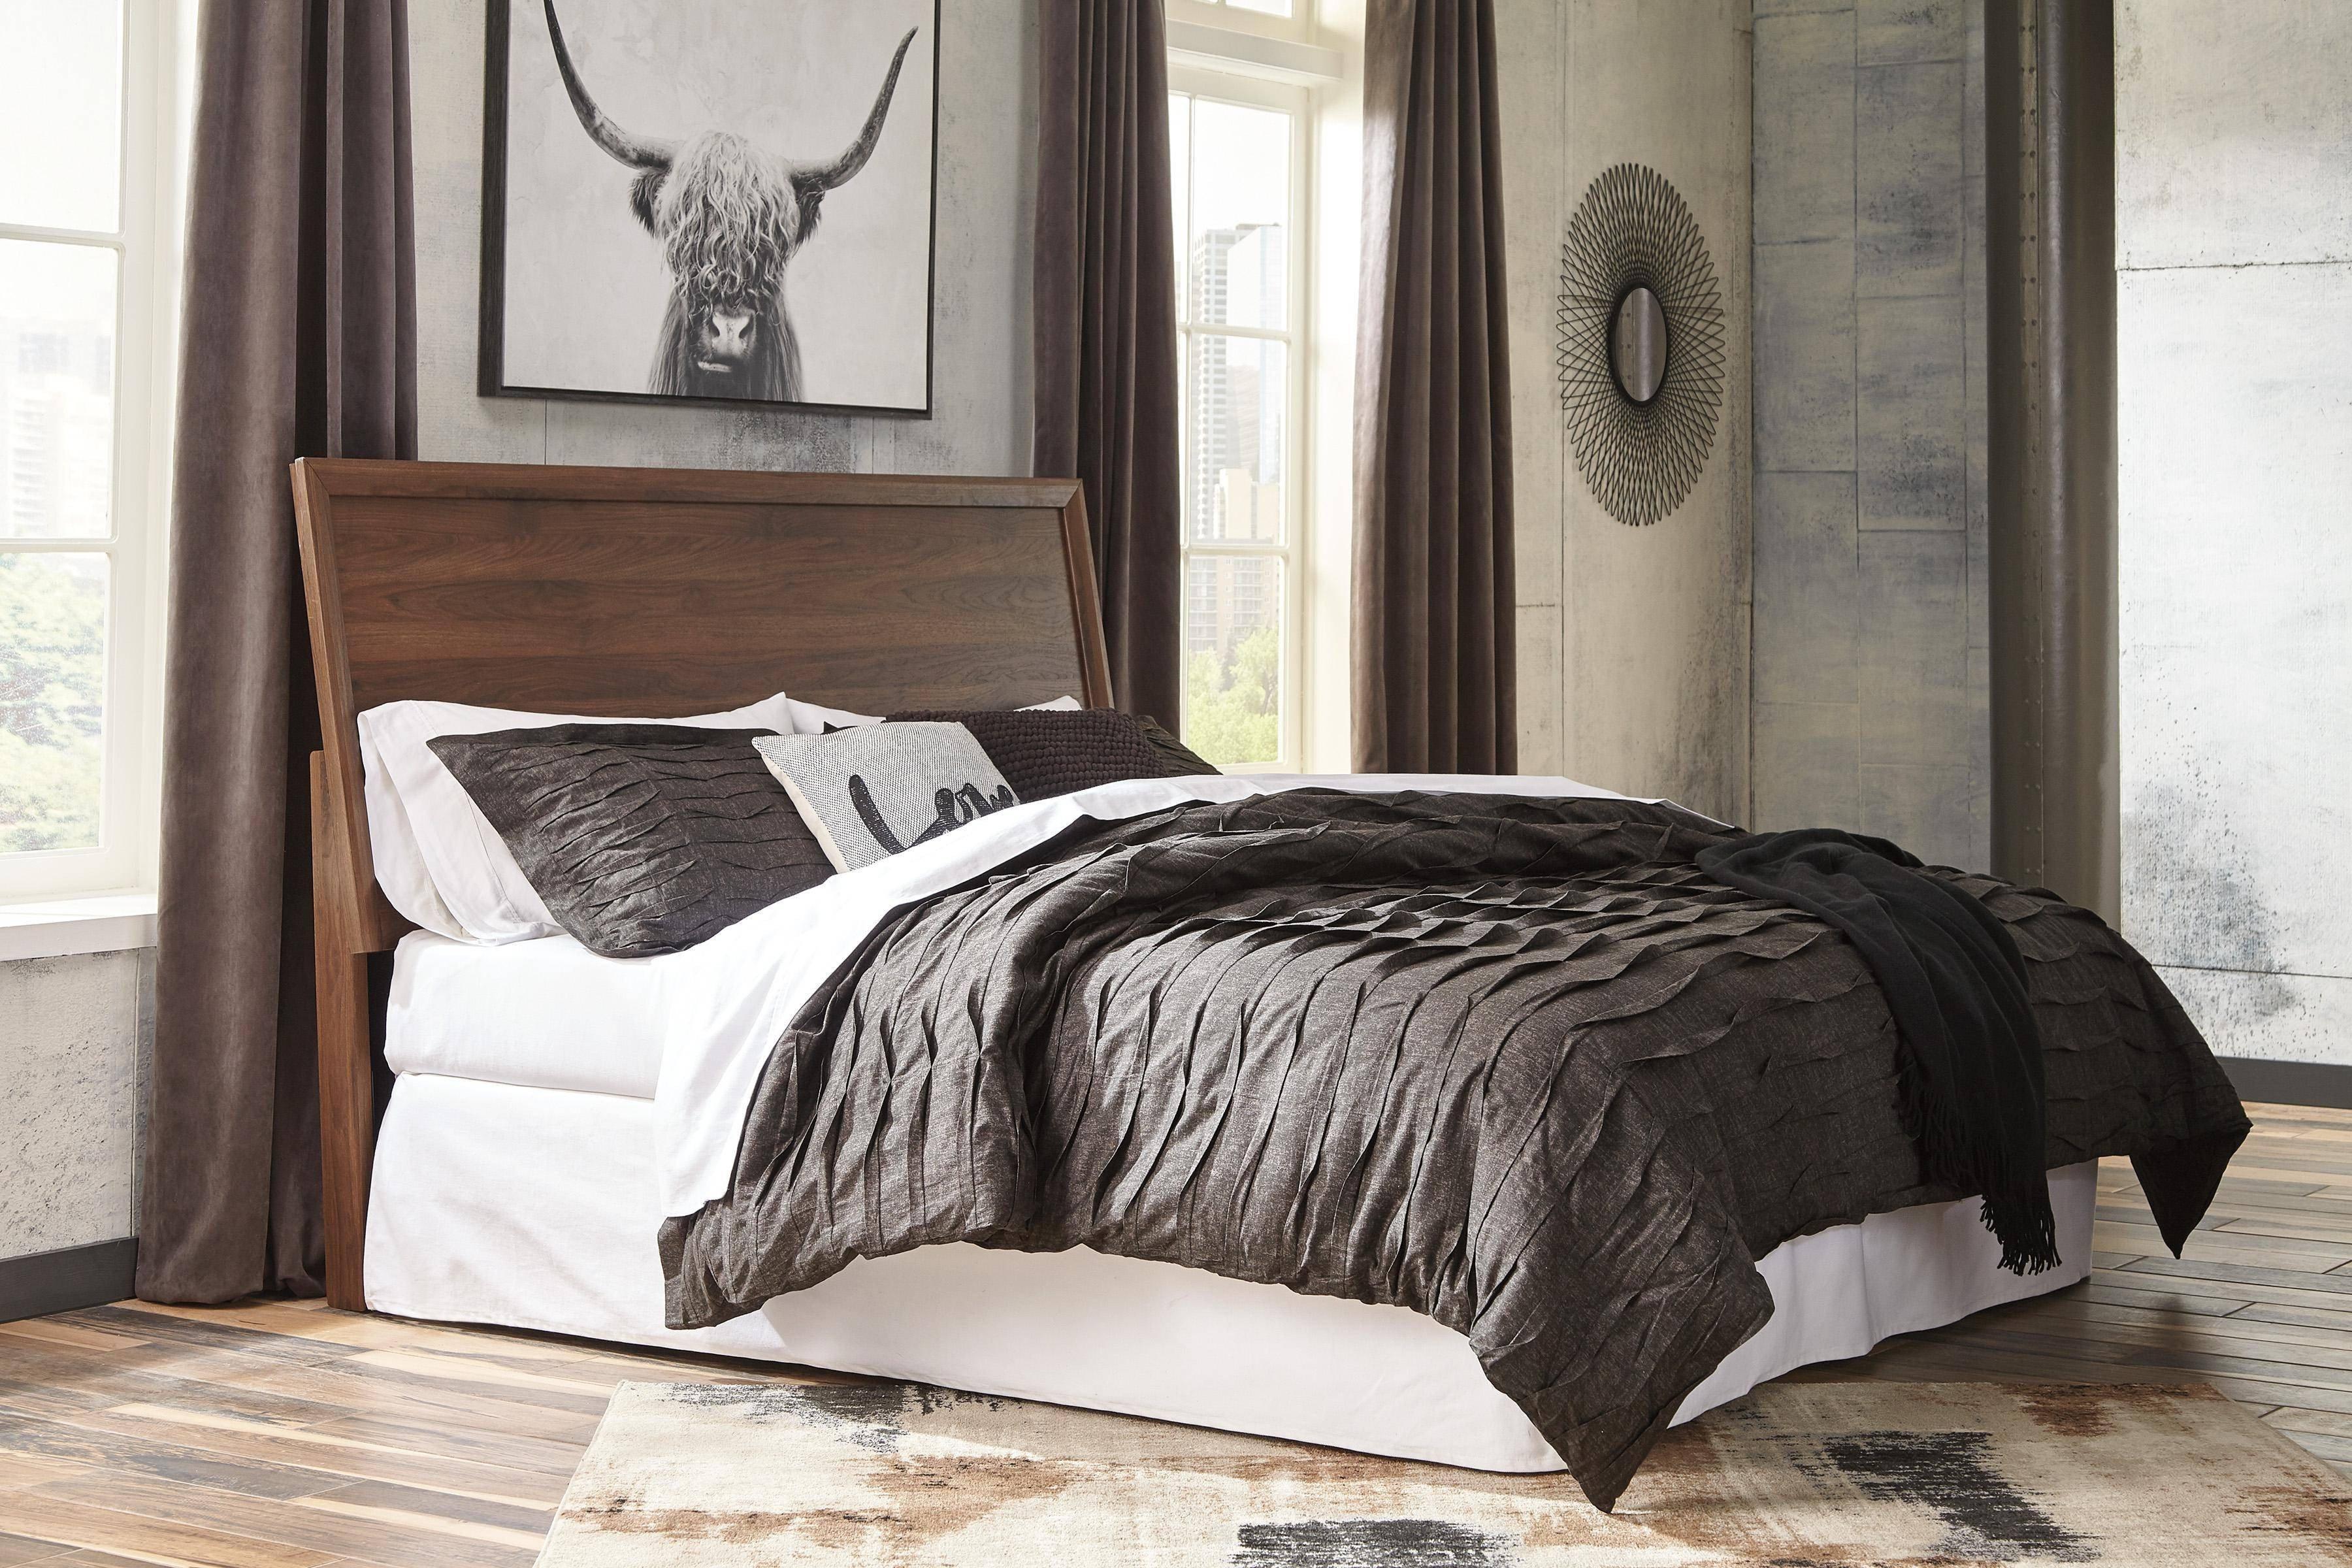 Cheap Modern Bedroom Set Best Of ashley Daneston B292 King Size Panel Bedroom Set 6pcs In